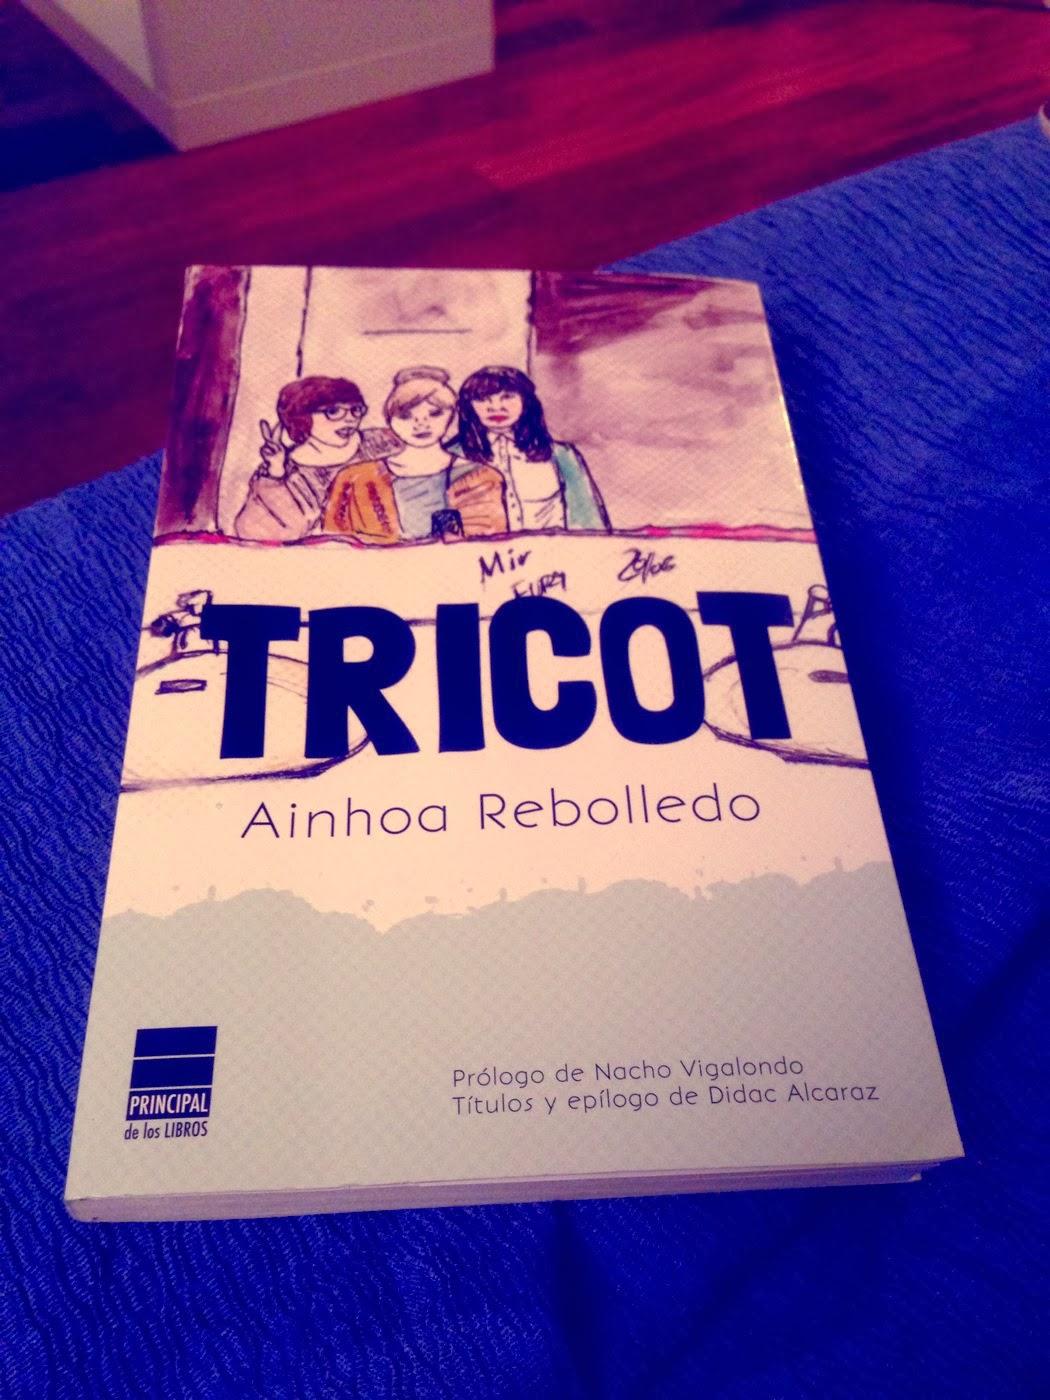 Tricot Ainoha Rebolledo